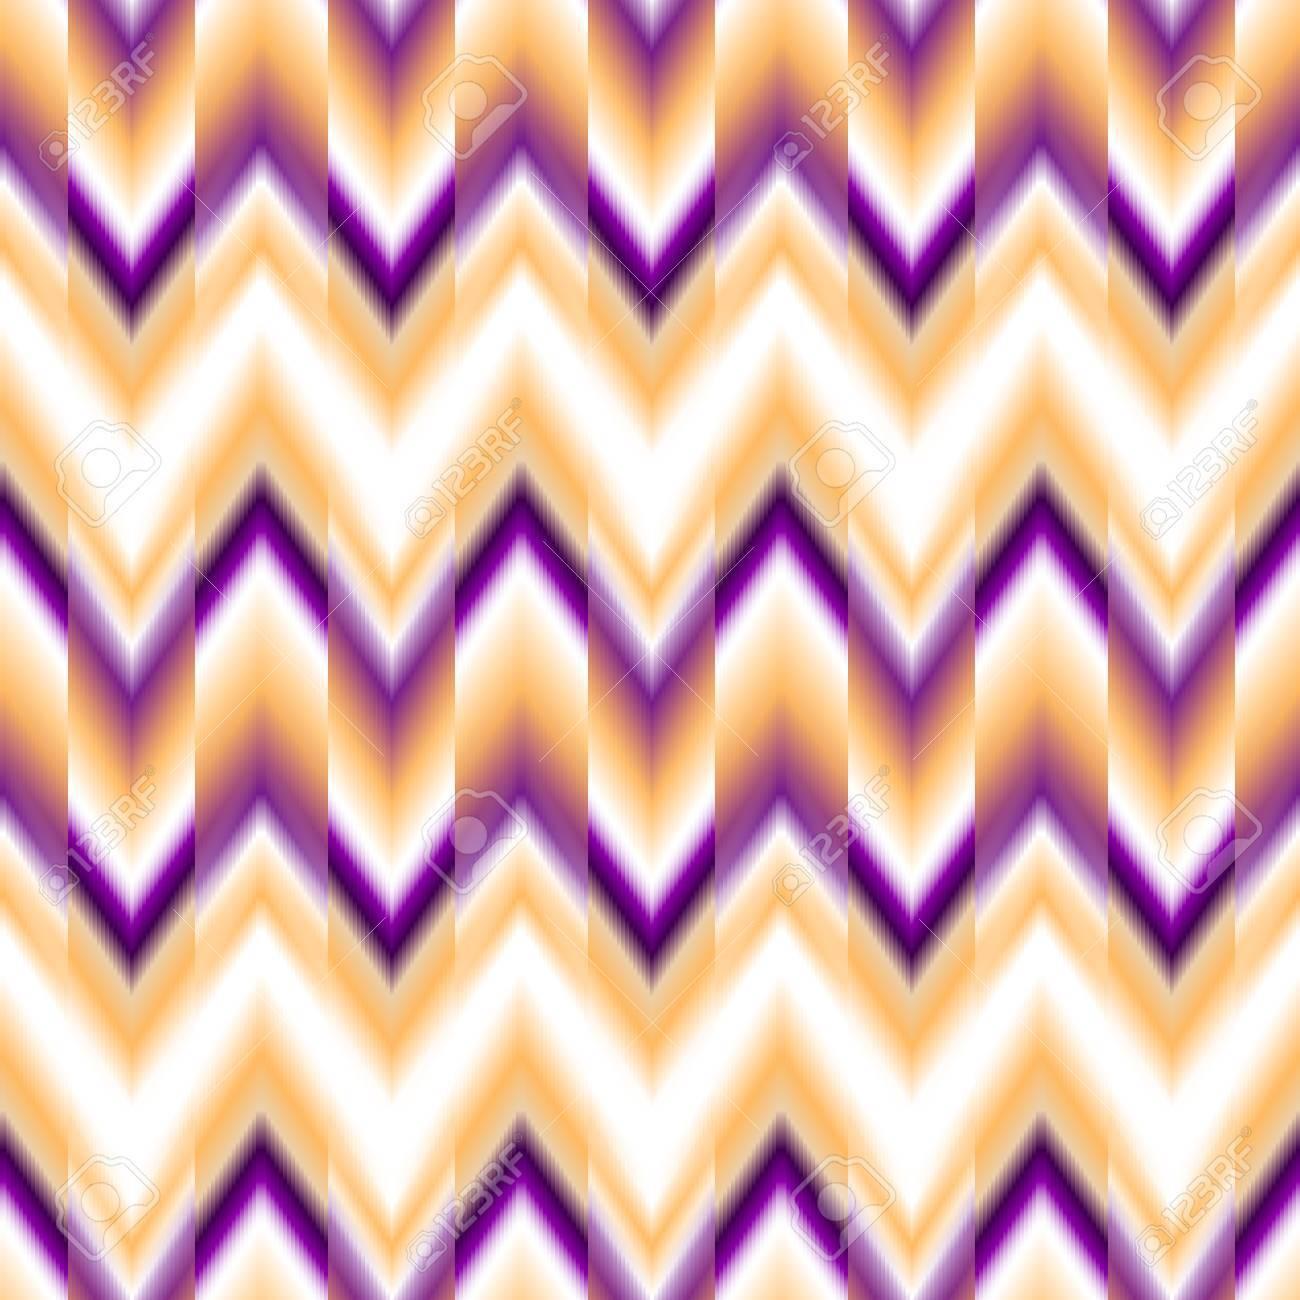 nahtlose ikat ethnische muster boho design ethnische farbige nahtlose zickzack patten standard - Boho Muster